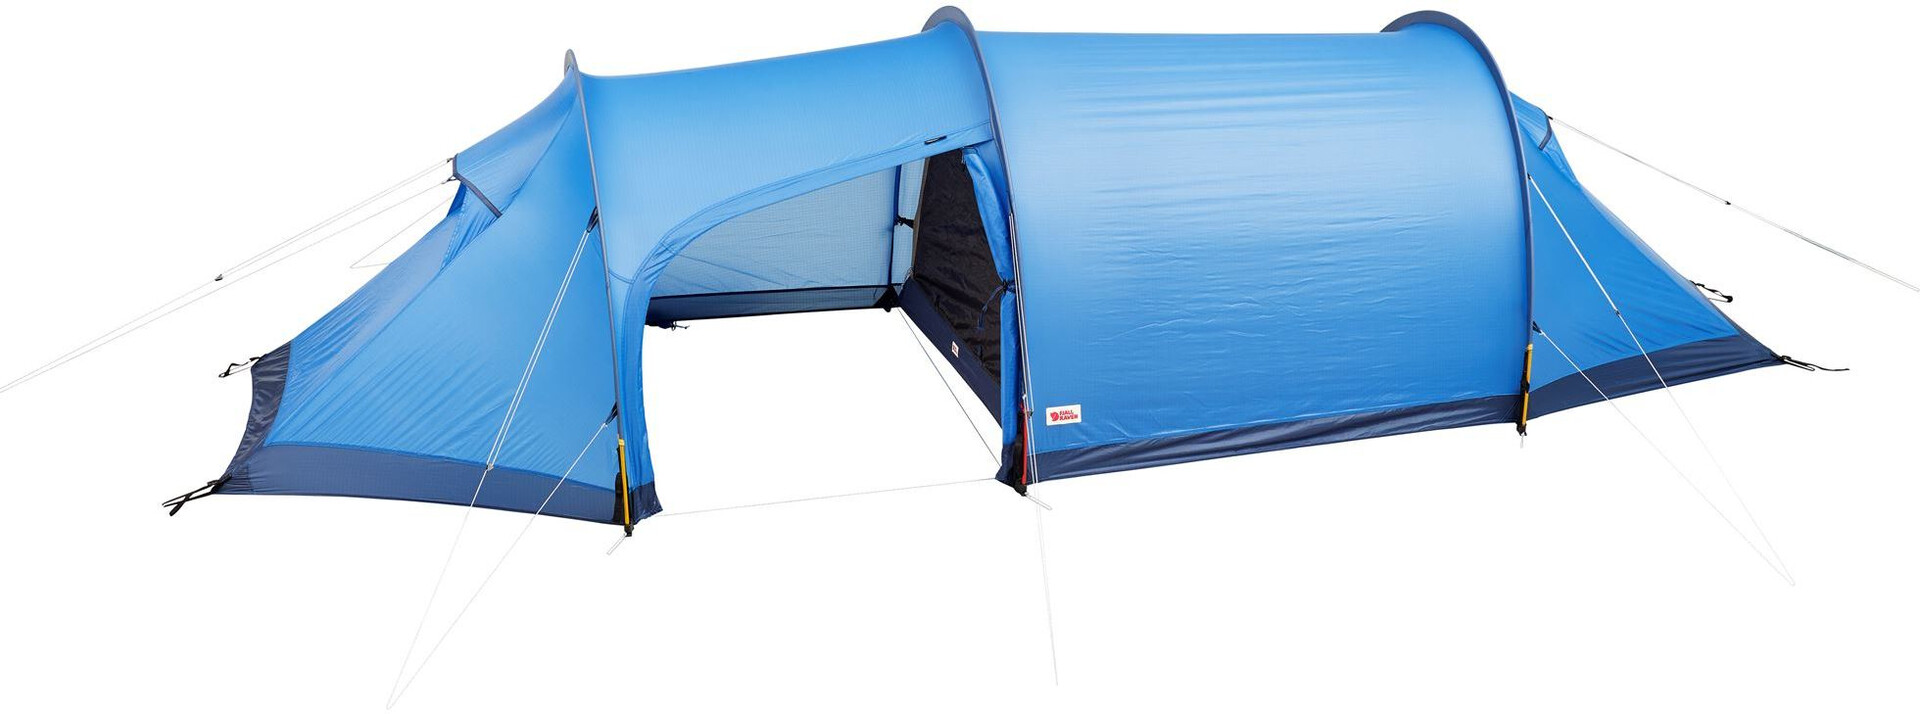 Fjällräven Abisko View 2 Tent, pine green l Online outdoor